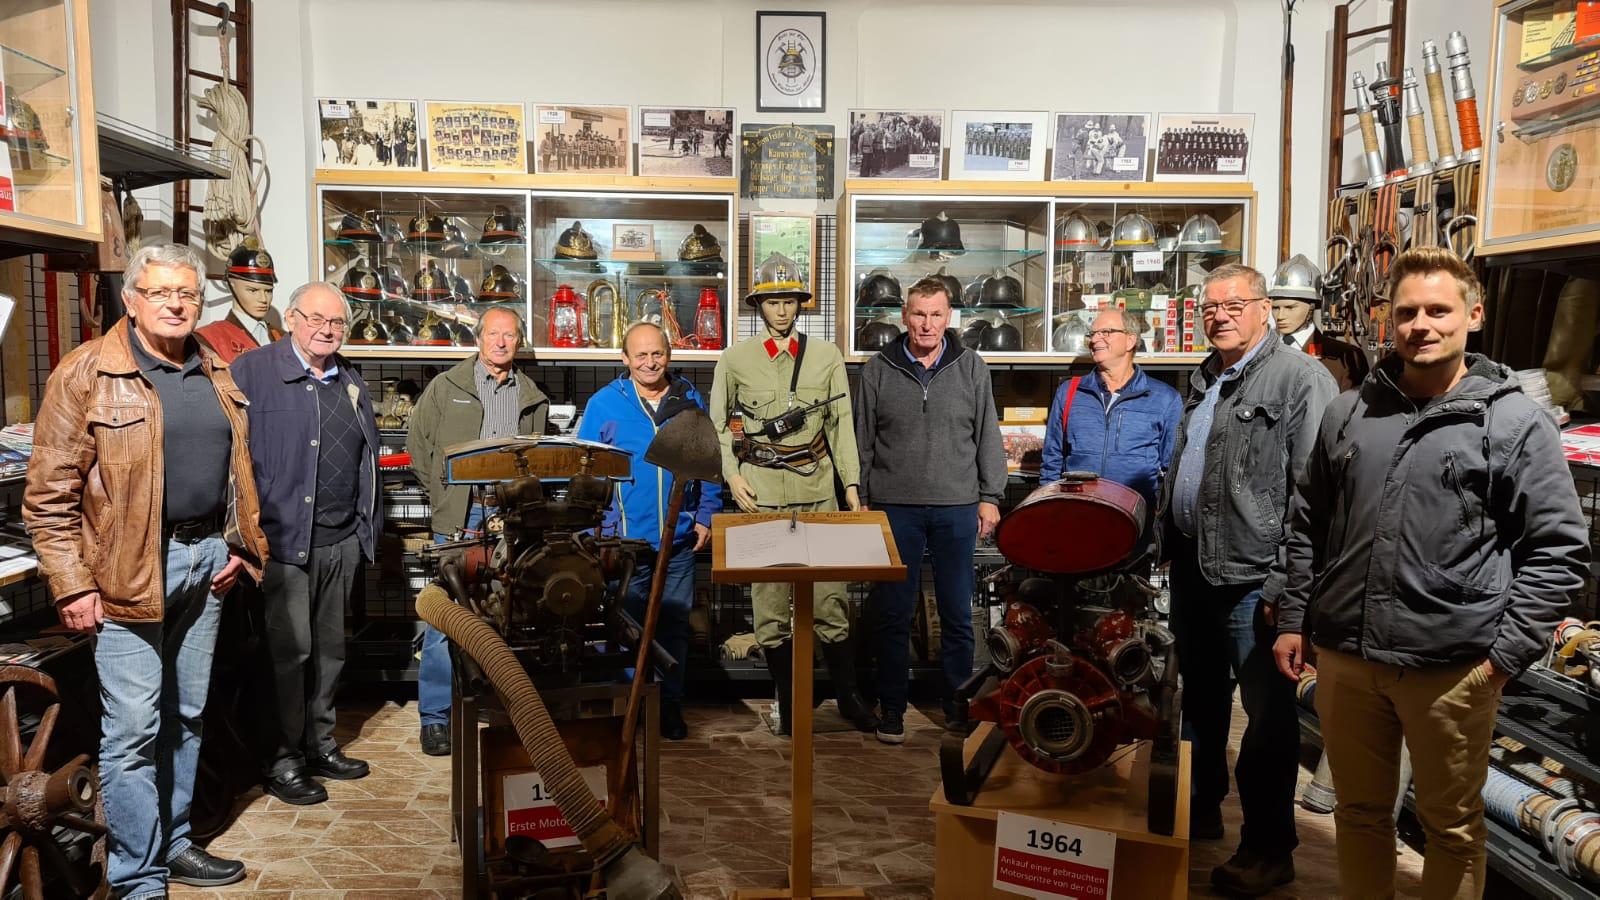 2020-10-15-Feuerwehrmuseum-Besuch